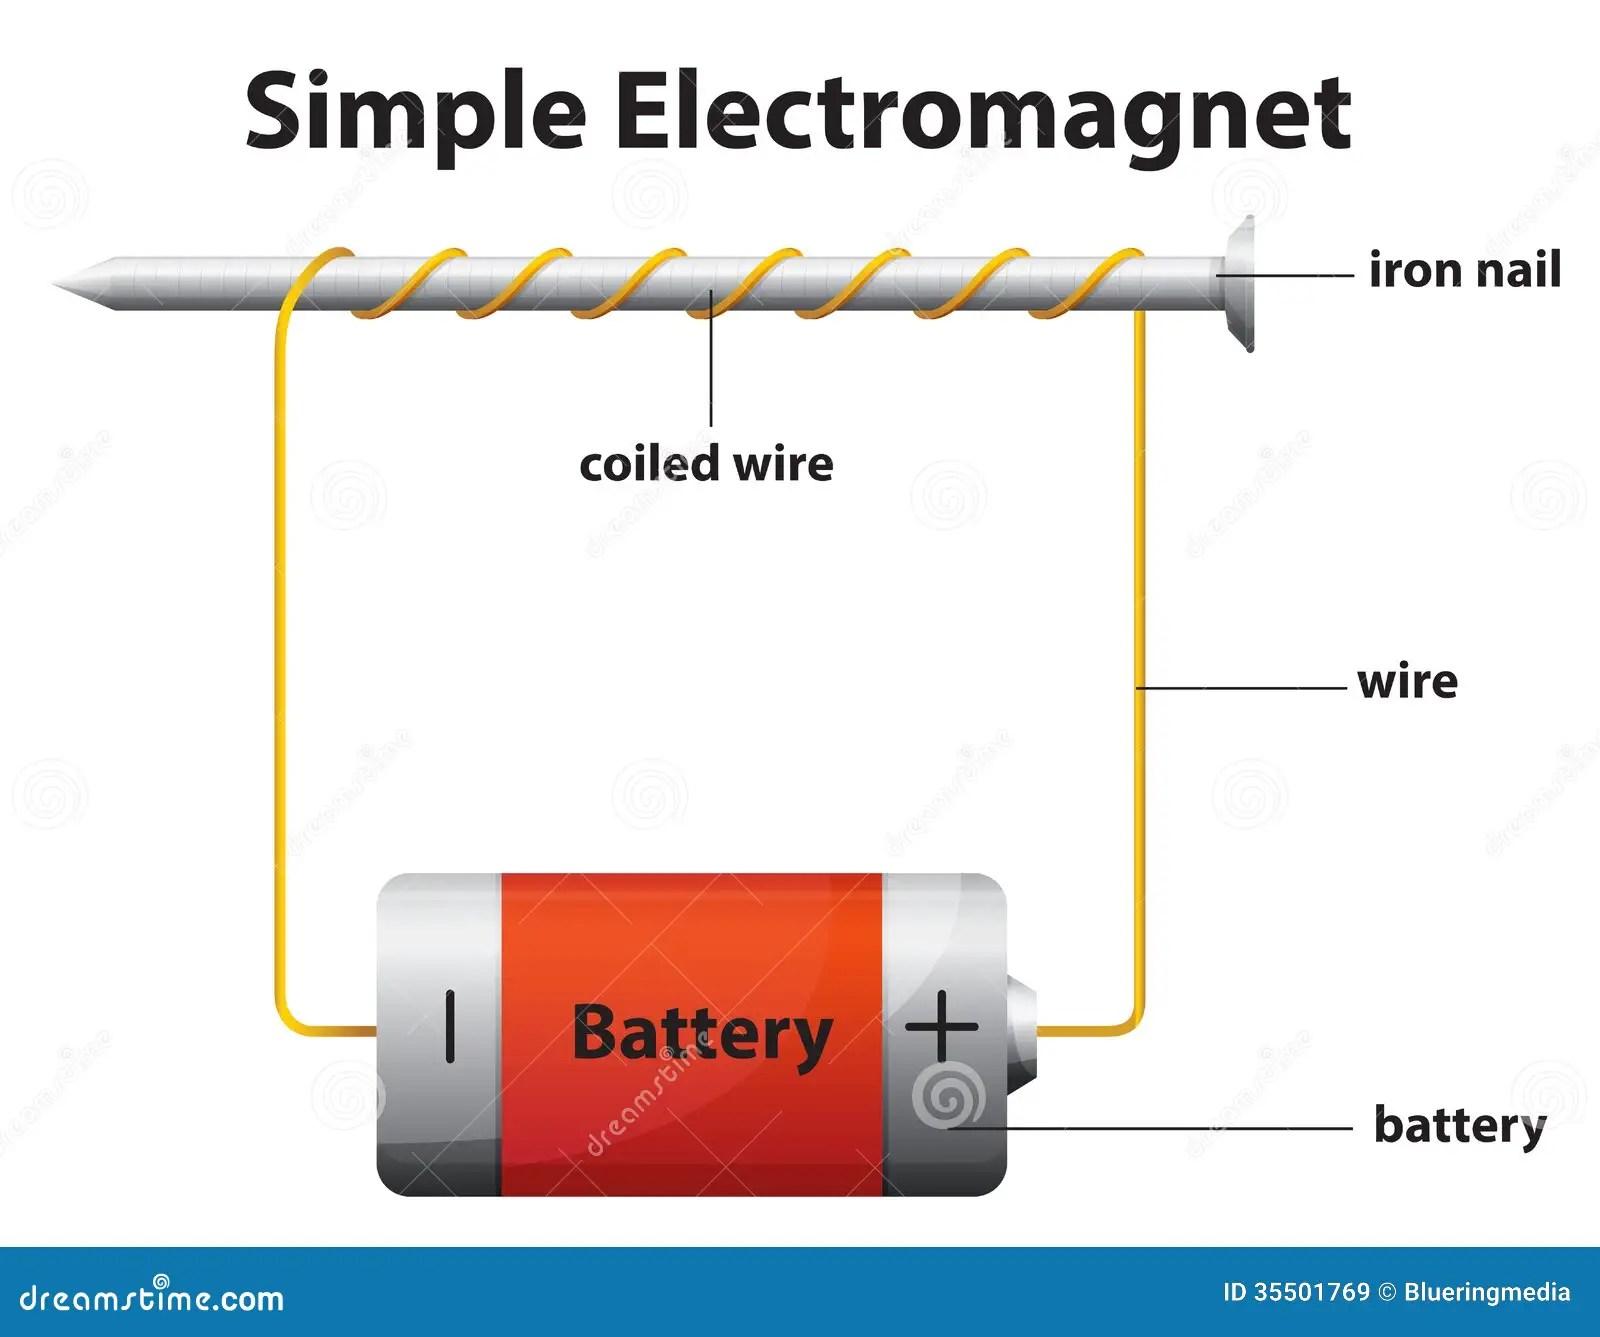 Magnetic Crane Wiring Diagram Free Download Wiring Diagram Schematic